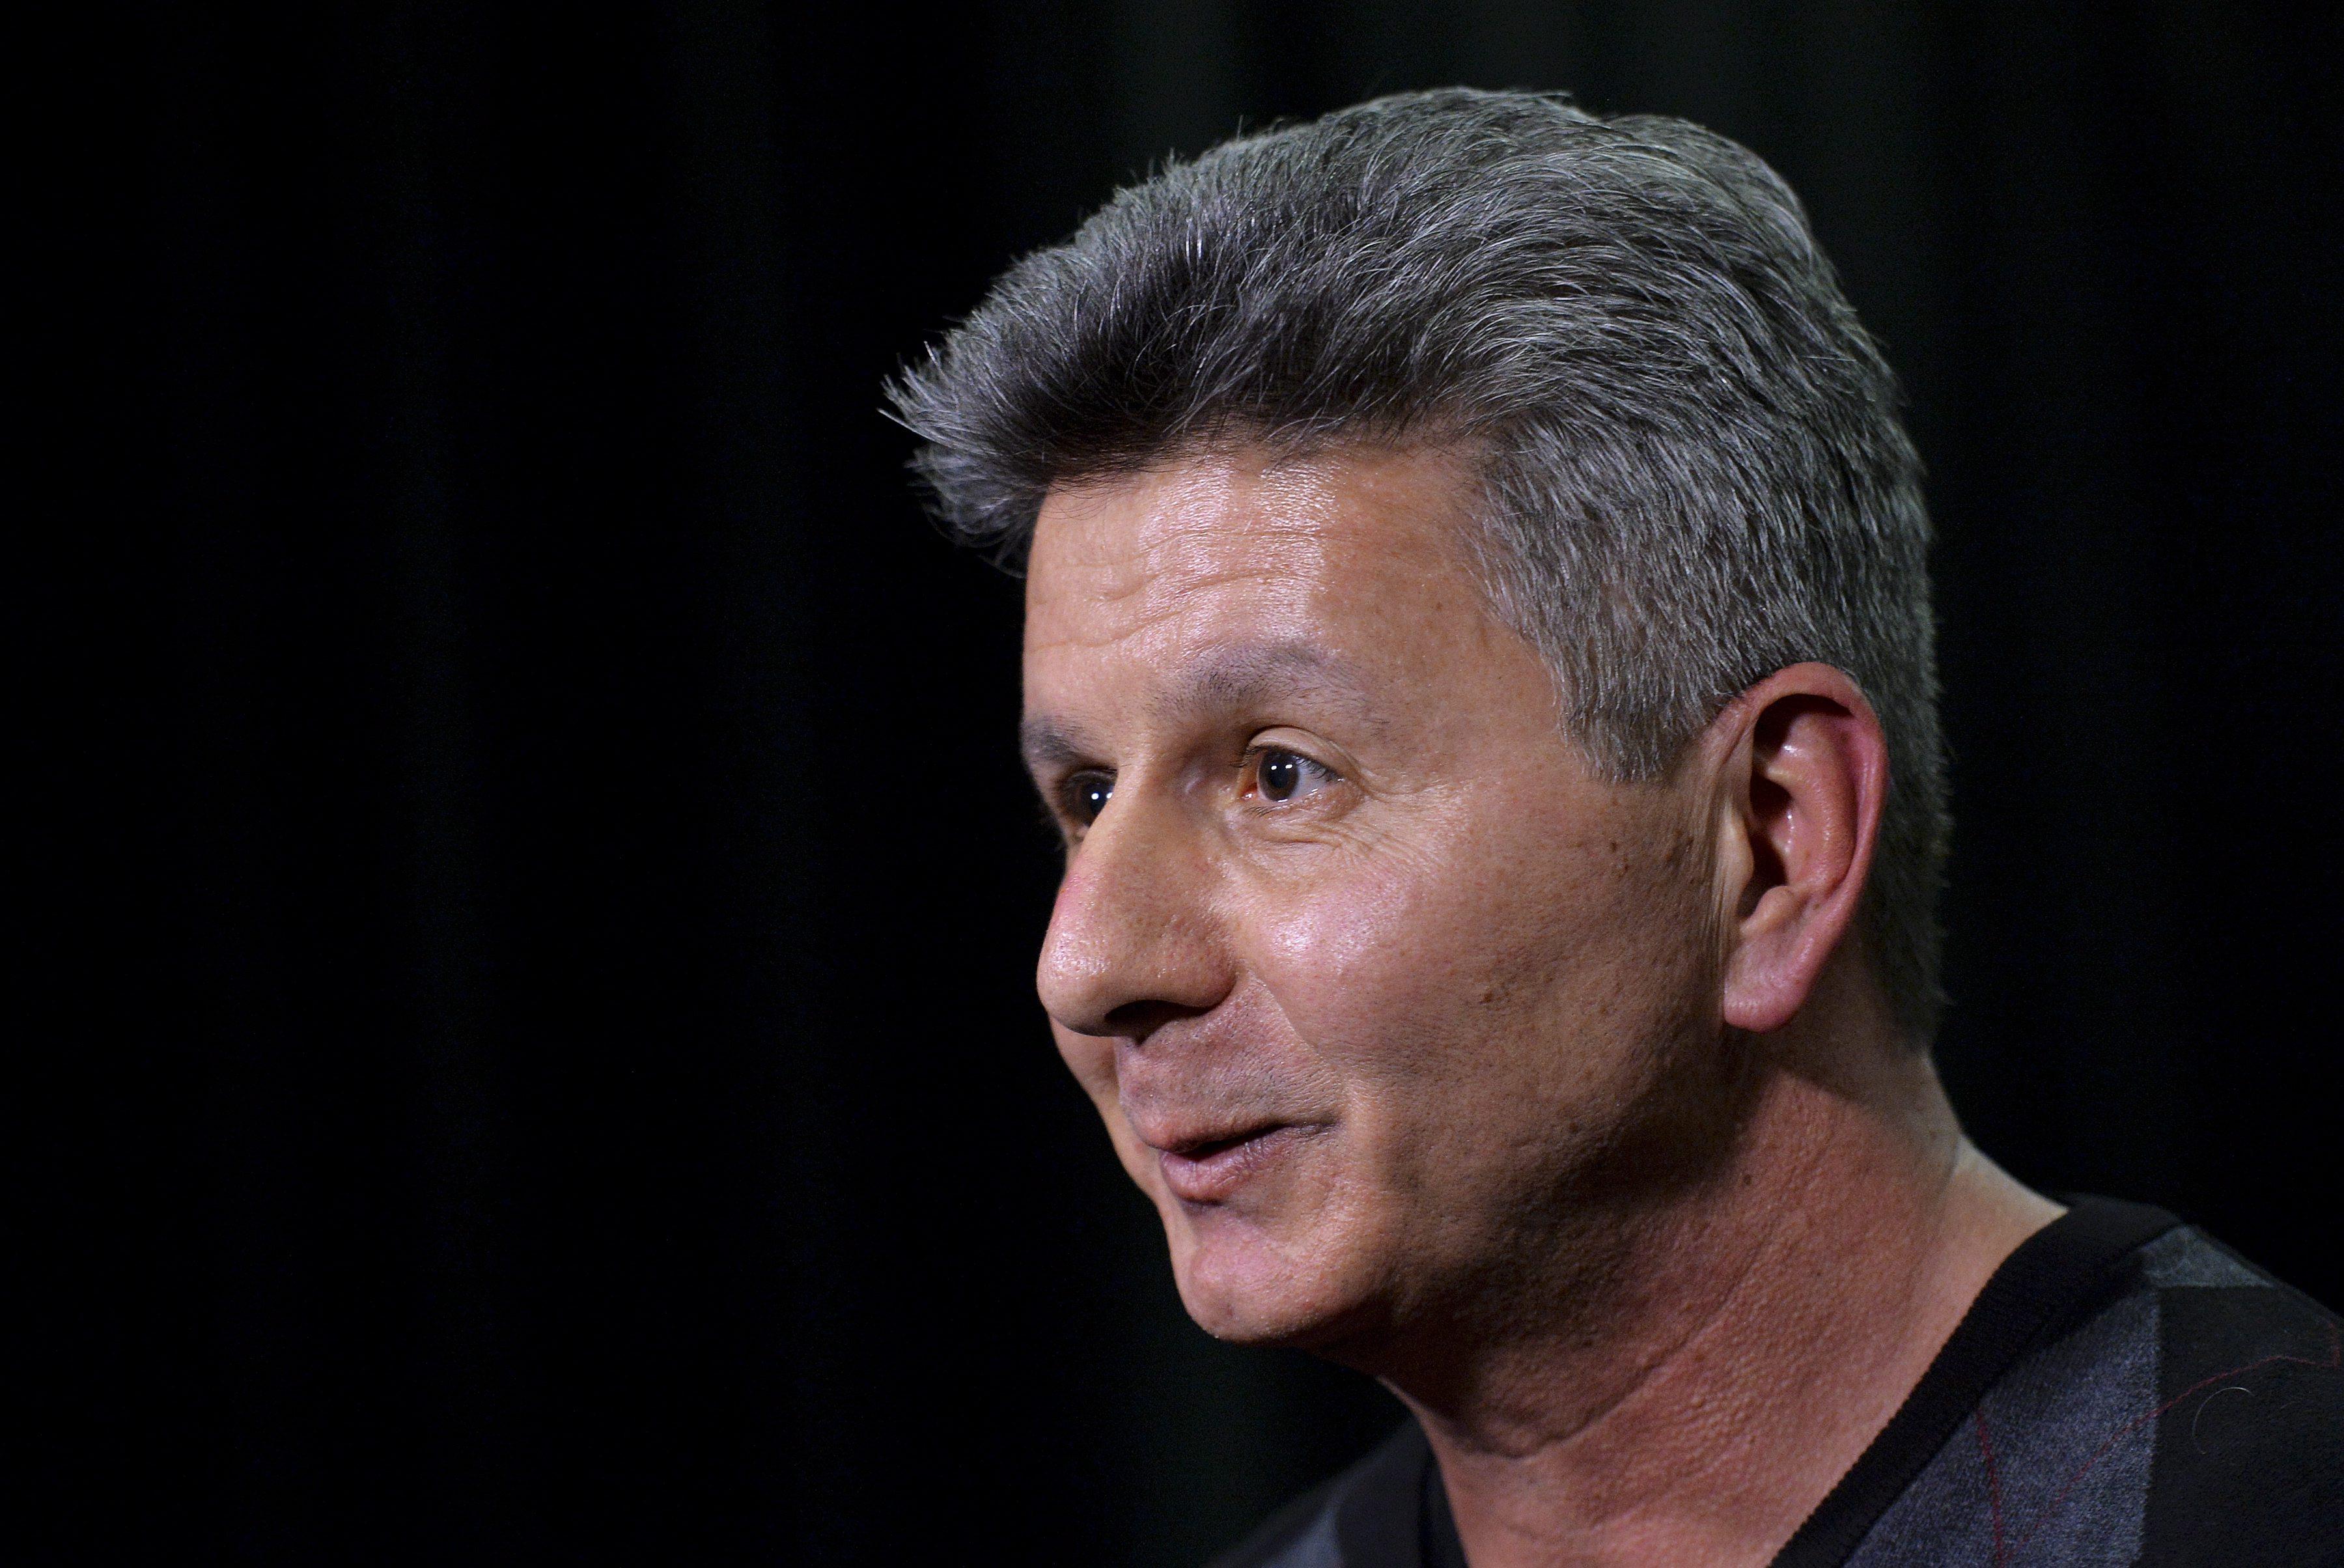 Toronto Blue Jays new interim general manager Tony LaCava speaks to the media in Toronto on Monday, Nov. 2, 2015.  (Nathan Denette/The Canadian Press via AP)